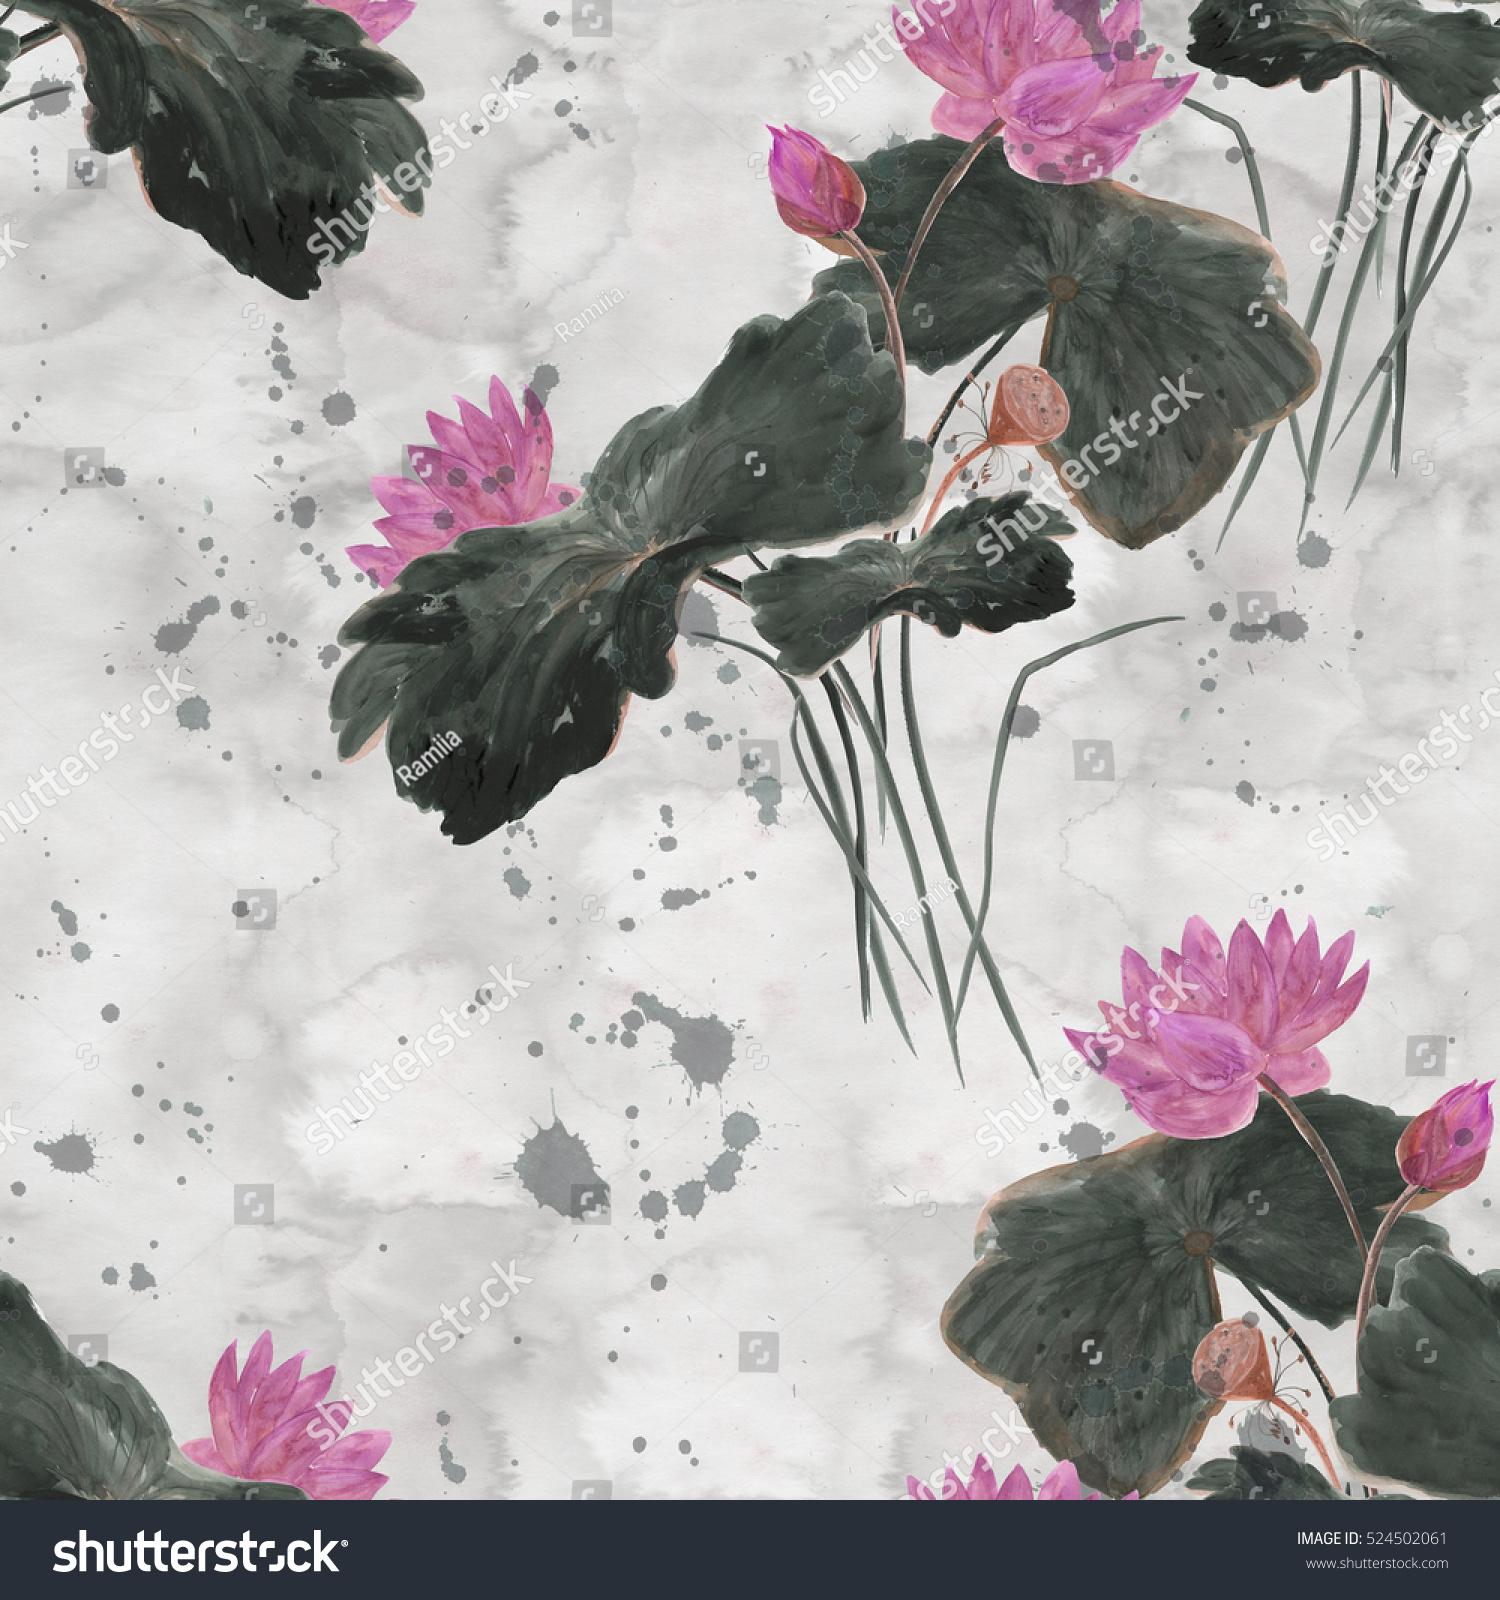 Chinese painting seamless pattern lotus asian stock illustration chinese painting seamless pattern with lotus asian style painting izmirmasajfo